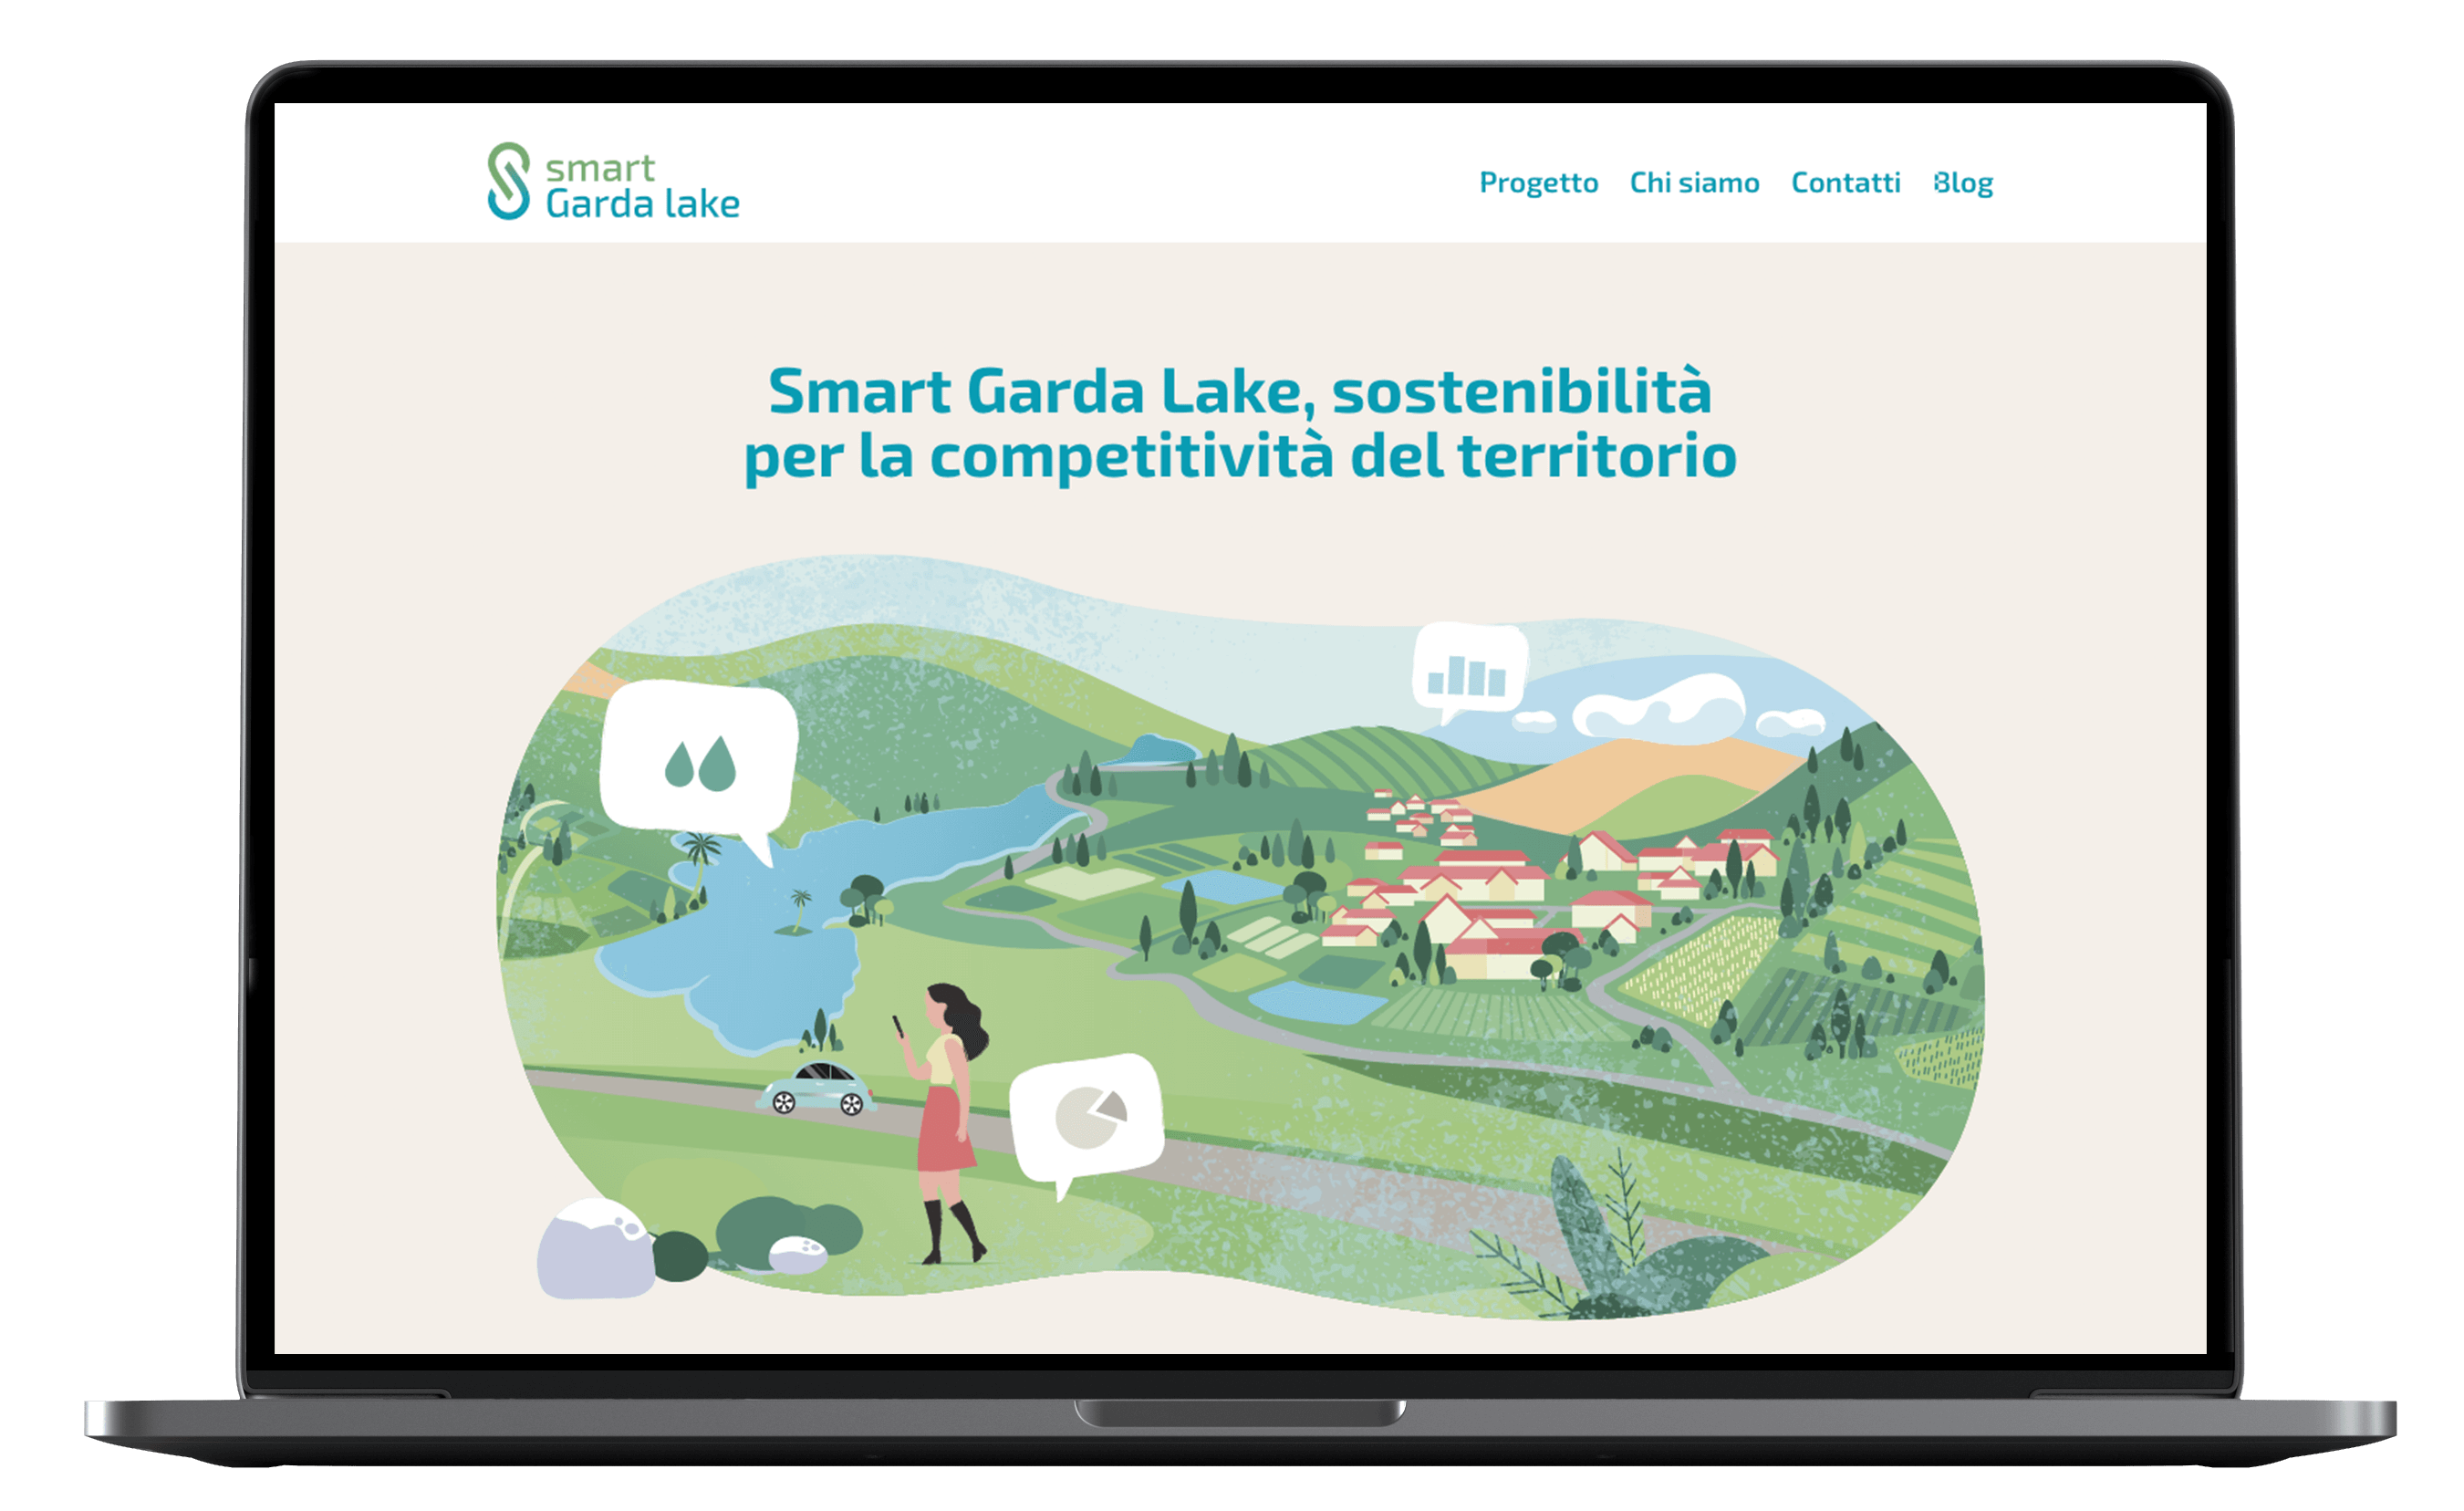 sito internet smartgardalake